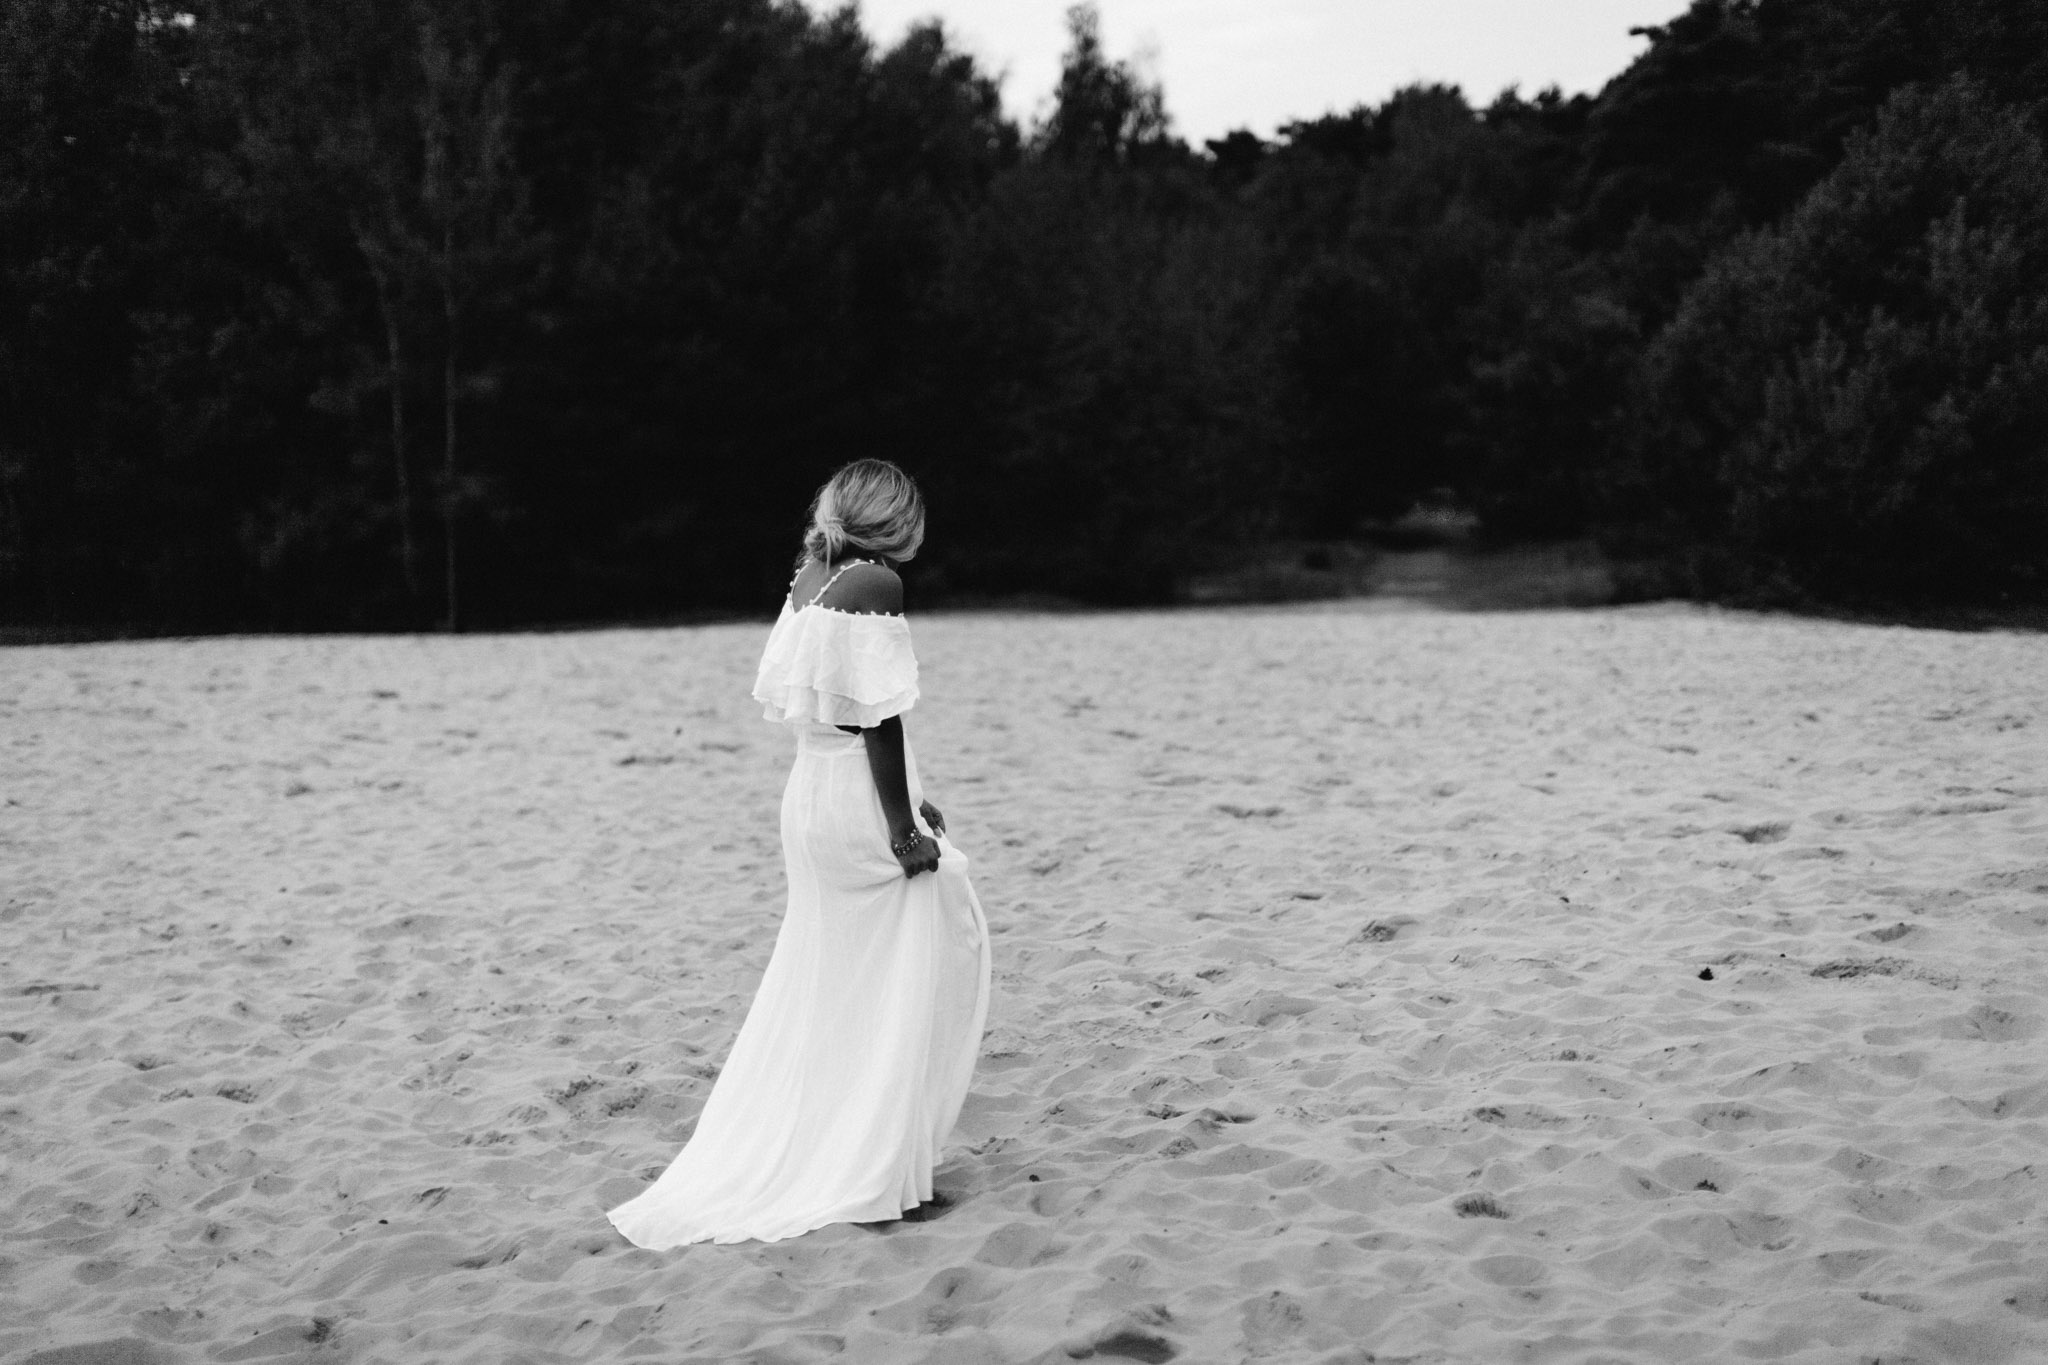 Speyer-Moroccan-Wedding-Inspiration-Pia-Anna-Christian-Wedding-Photography-S-86.jpg